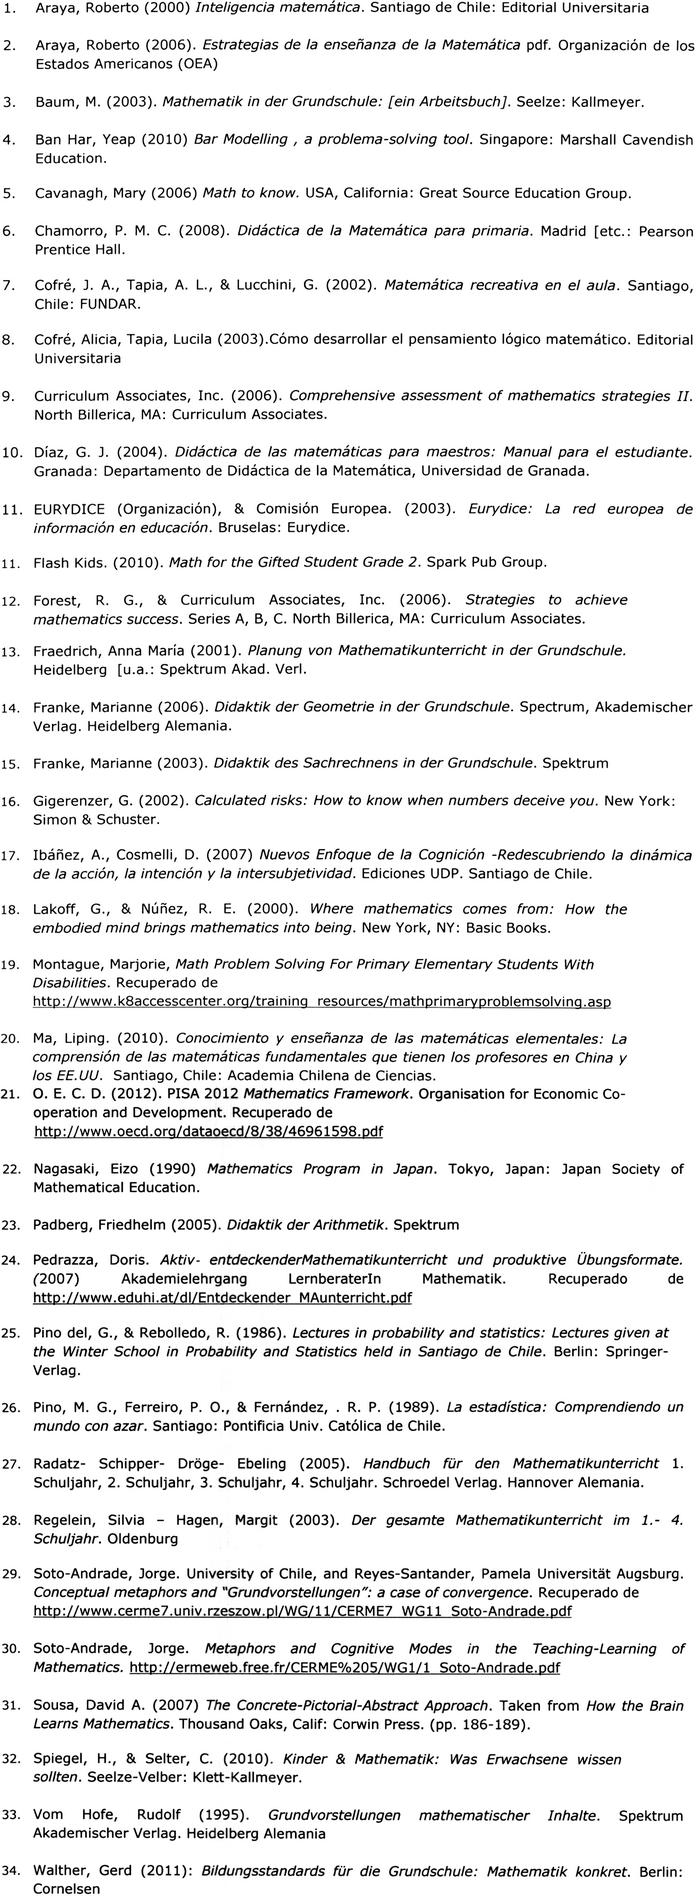 DTO-439 28-ENE-2012 MINISTERIO DE EDUCACIÓN - Ley Chile - Biblioteca ...